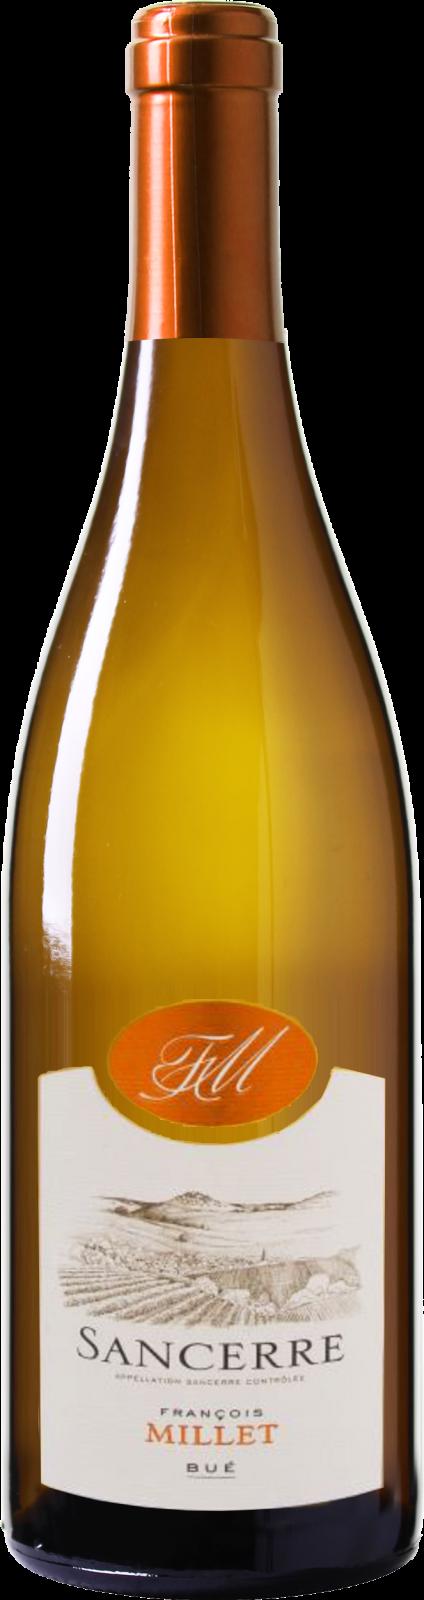 François Millet Bue Sancerre wijnbeurs.nl